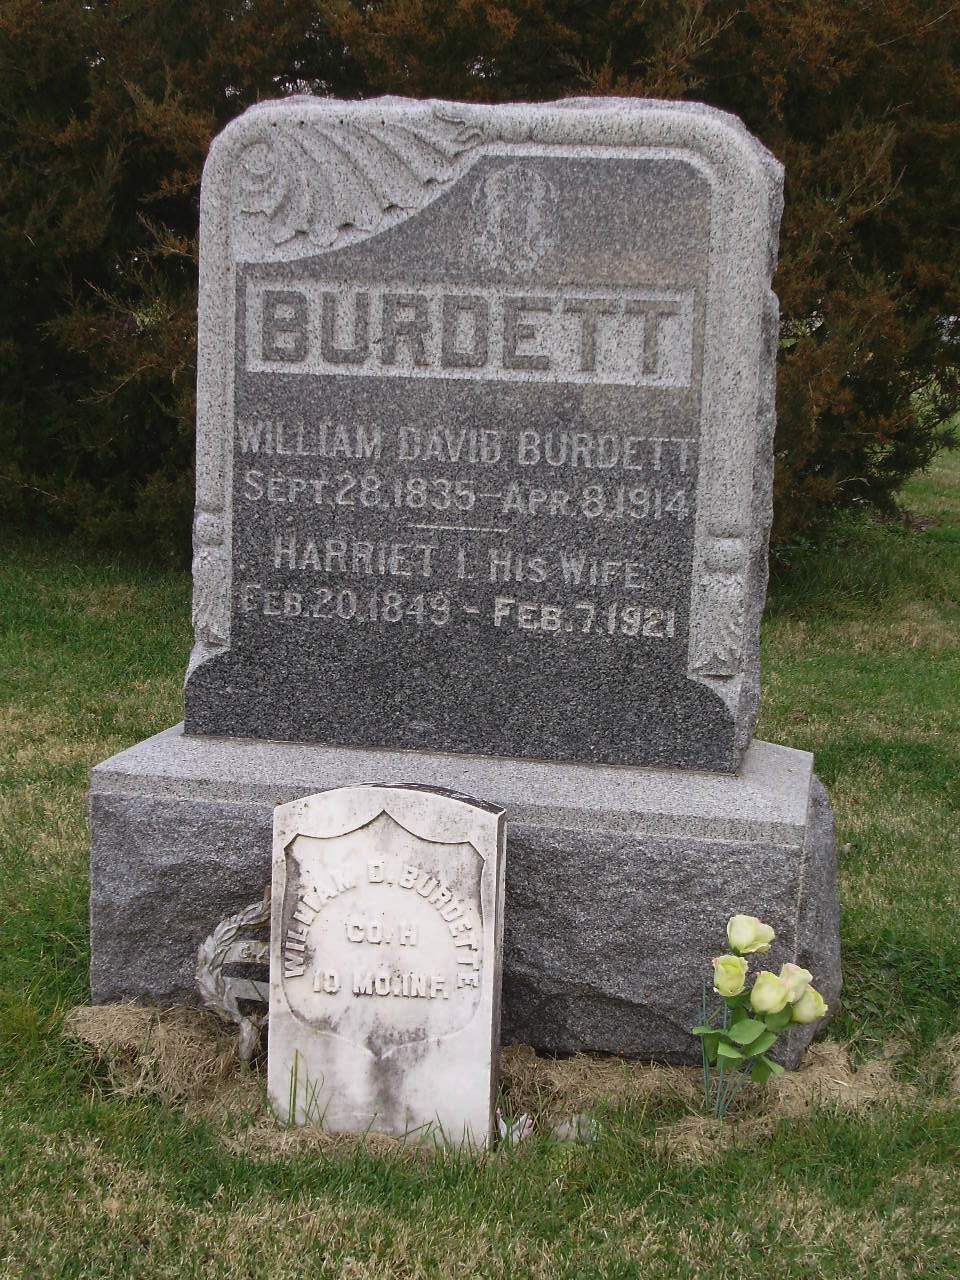 William David Burdett